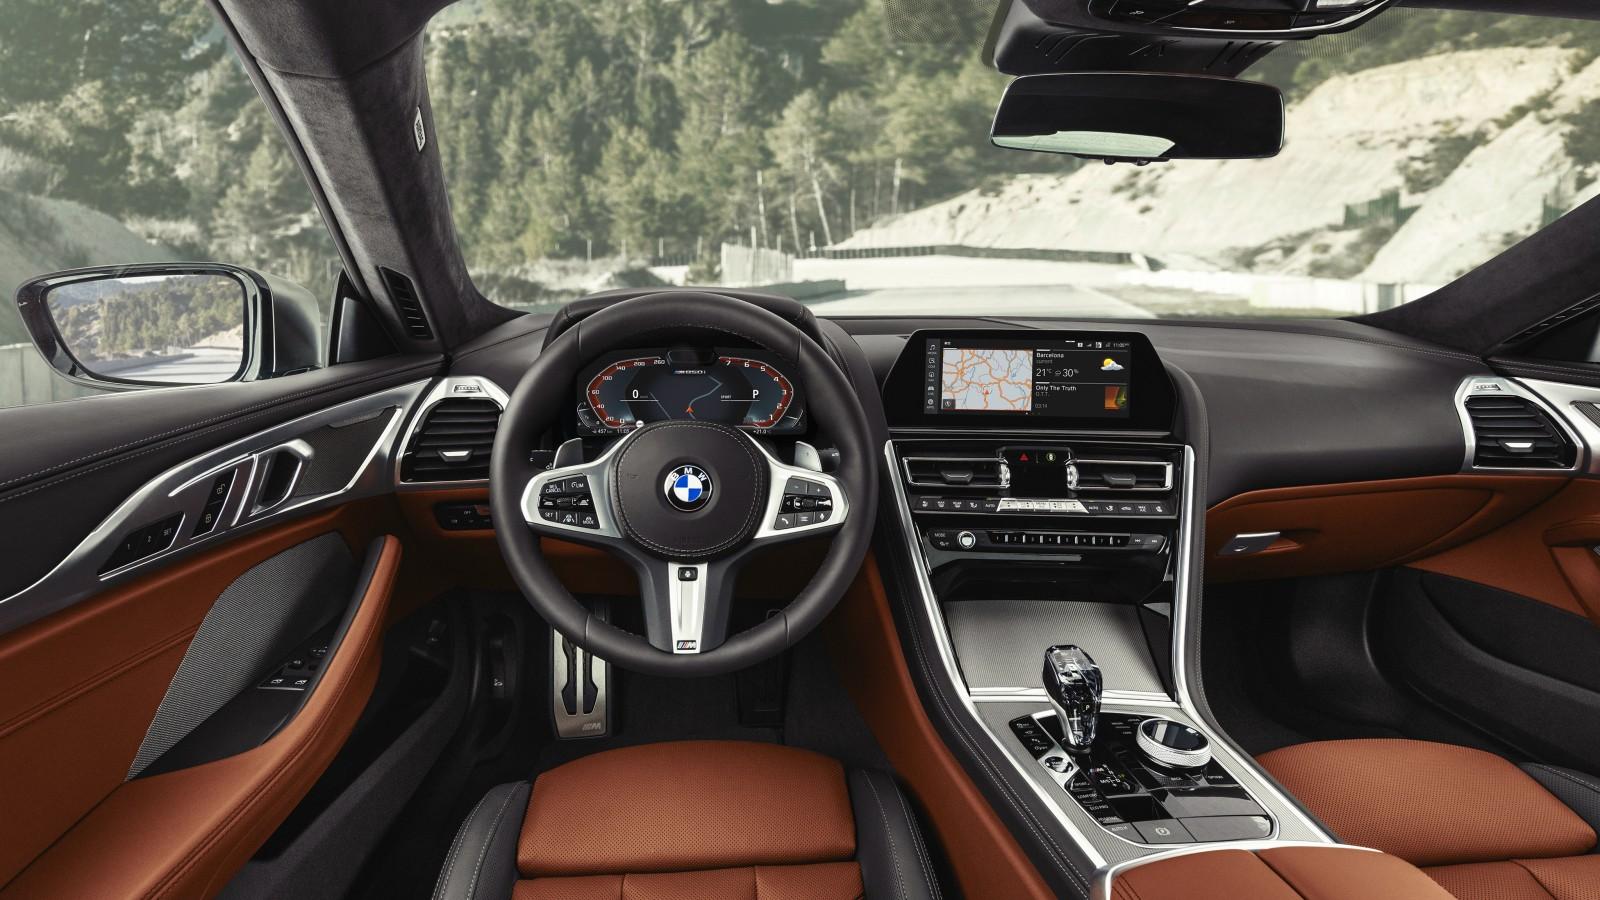 Bmw M850i Xdrive 2018 4k Interior Wallpaper Hd Car